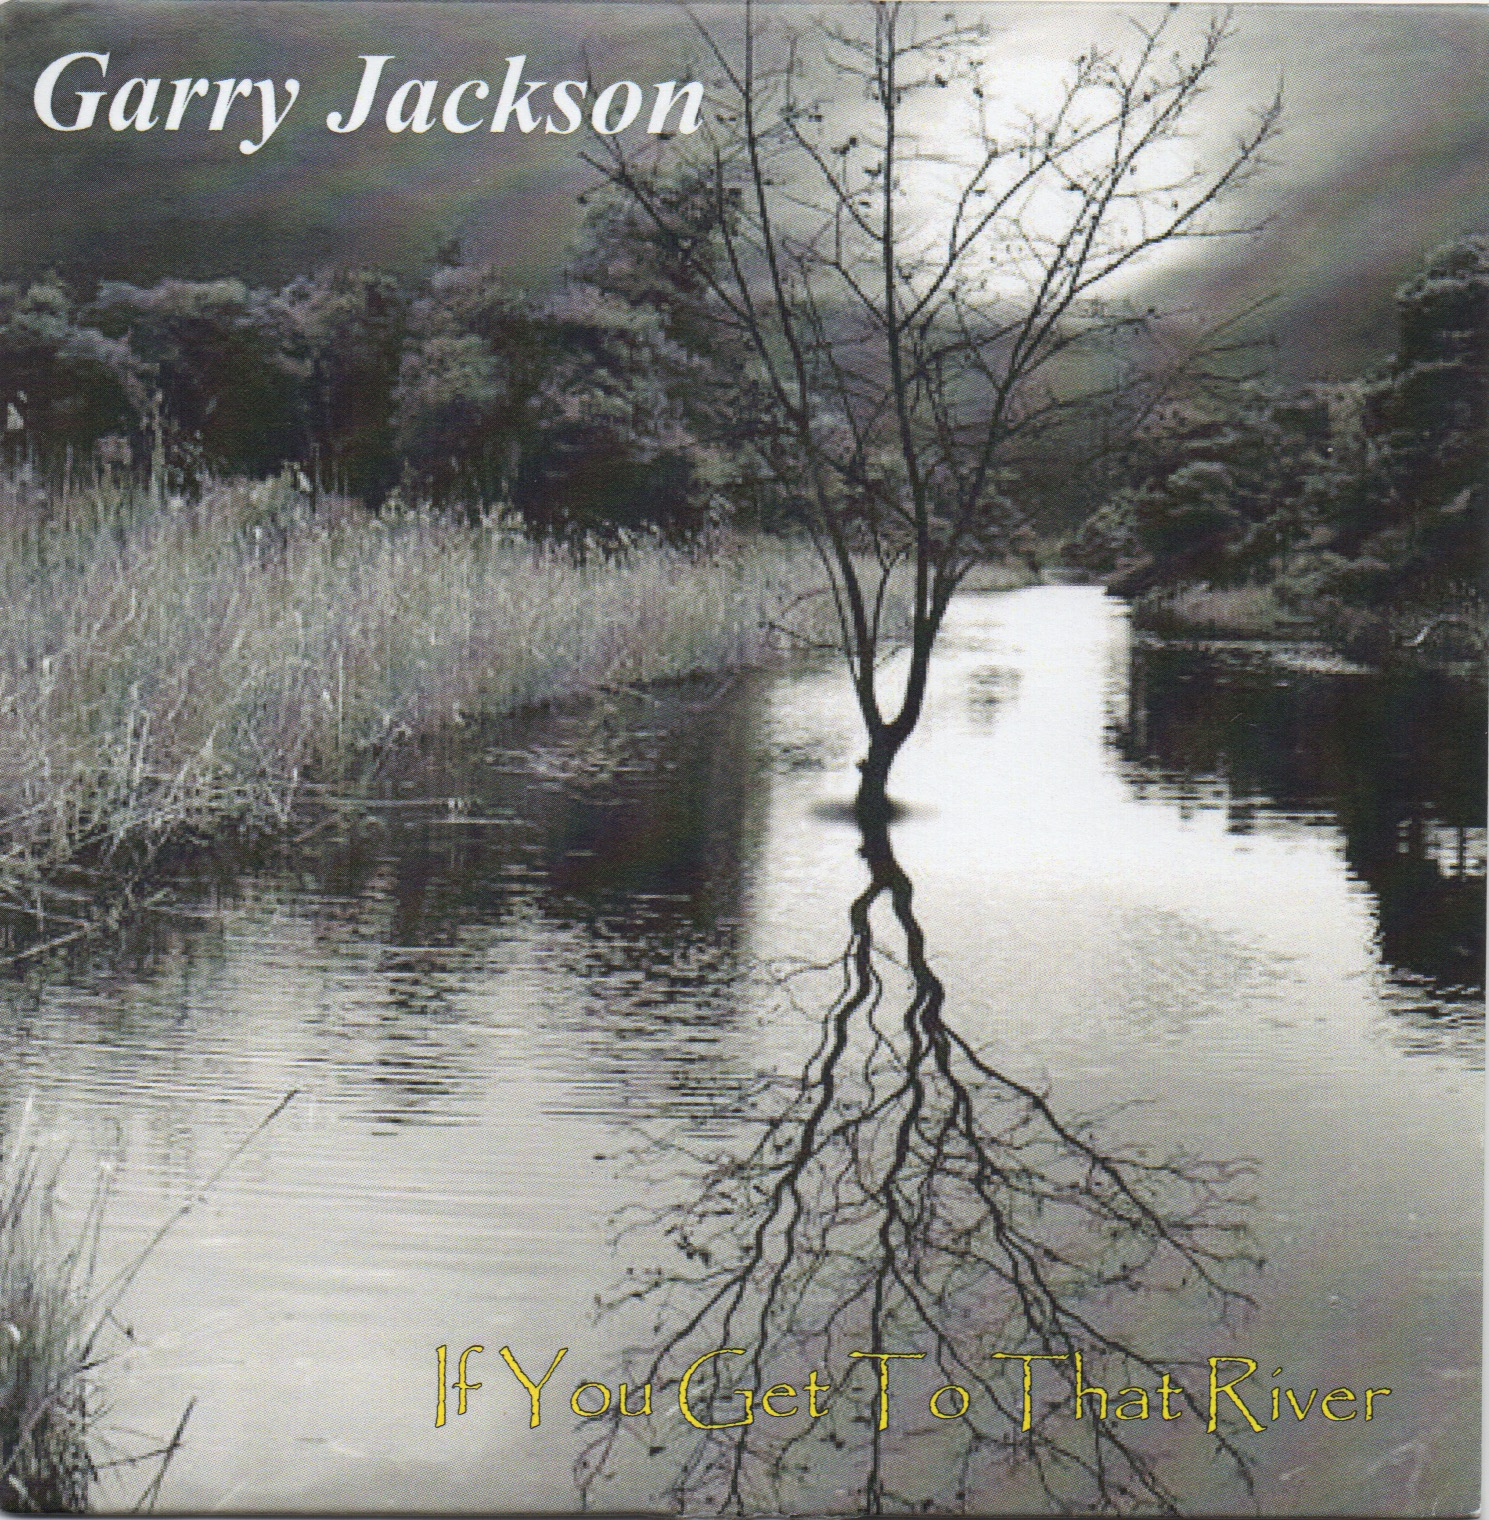 Garry Jackson